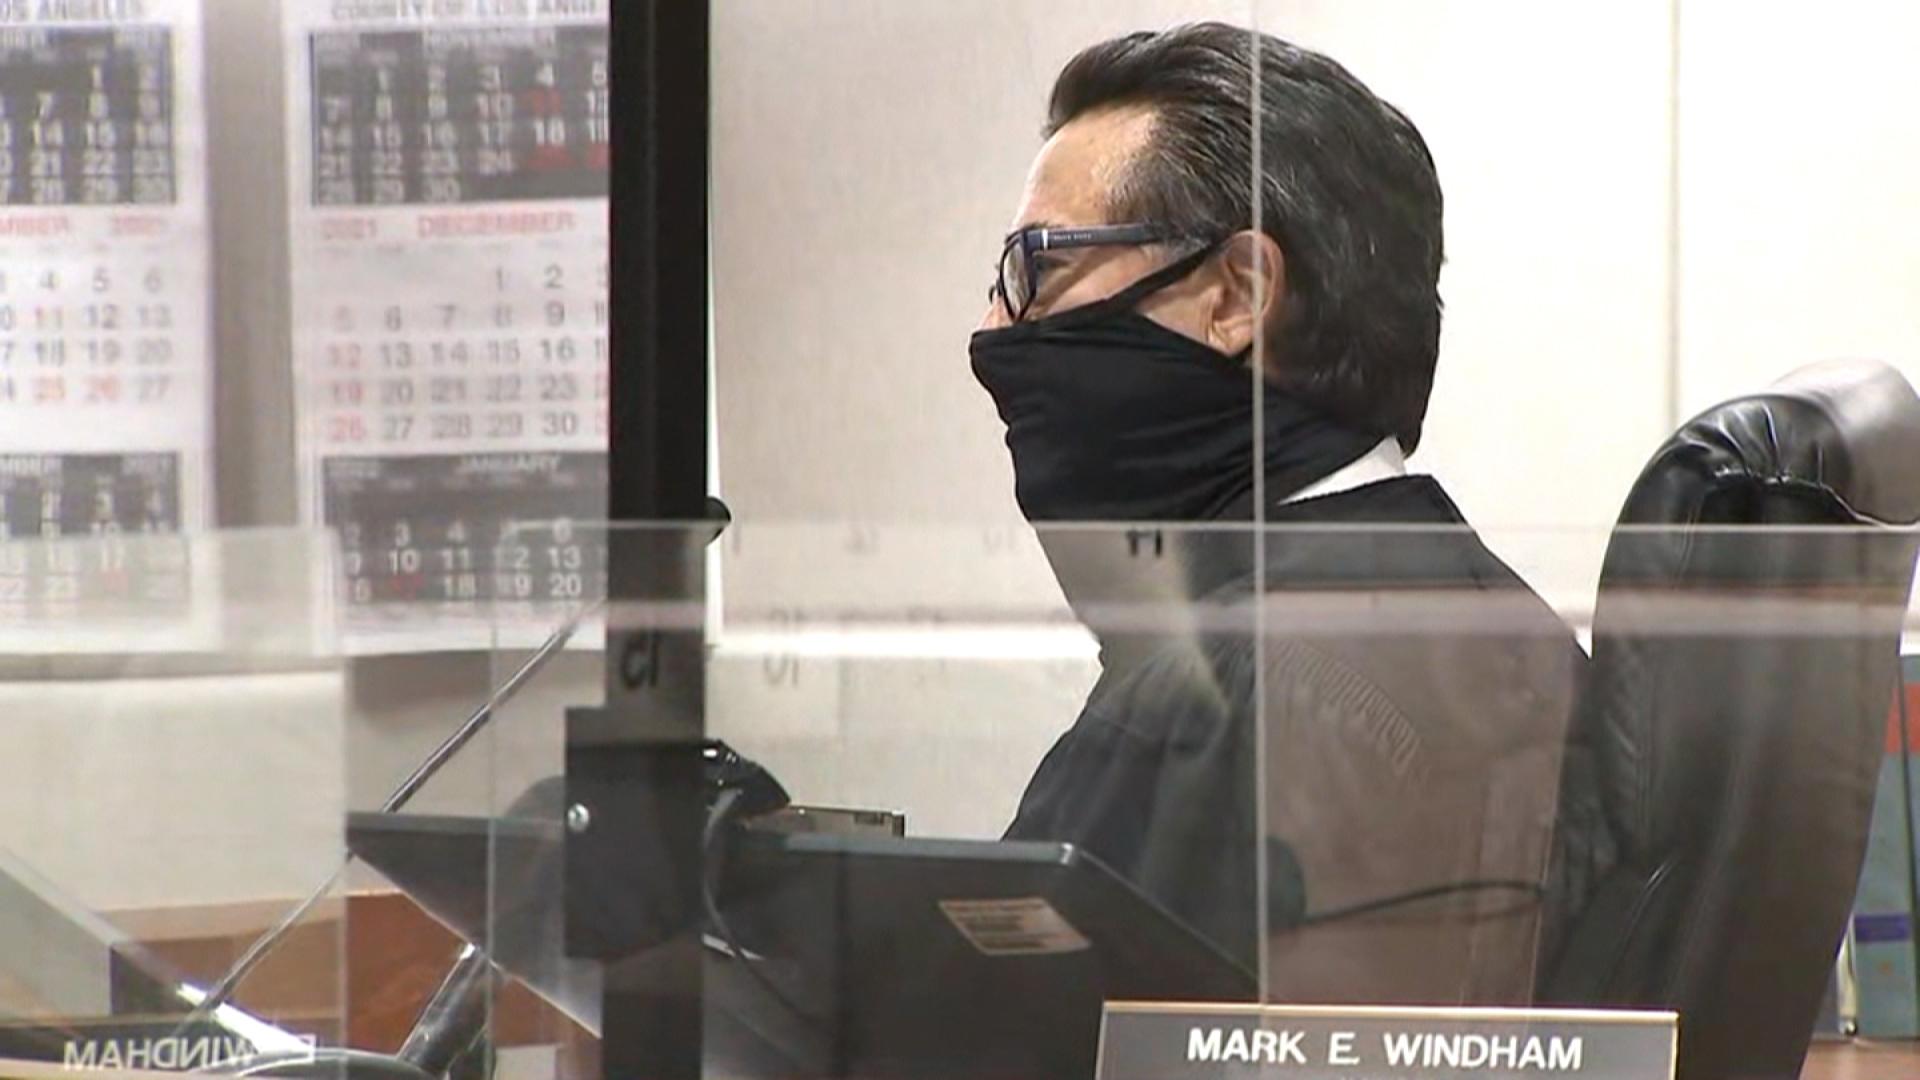 Judge Mark Windham speaks during Robert Durst's sentencing on Thursday, October 14.